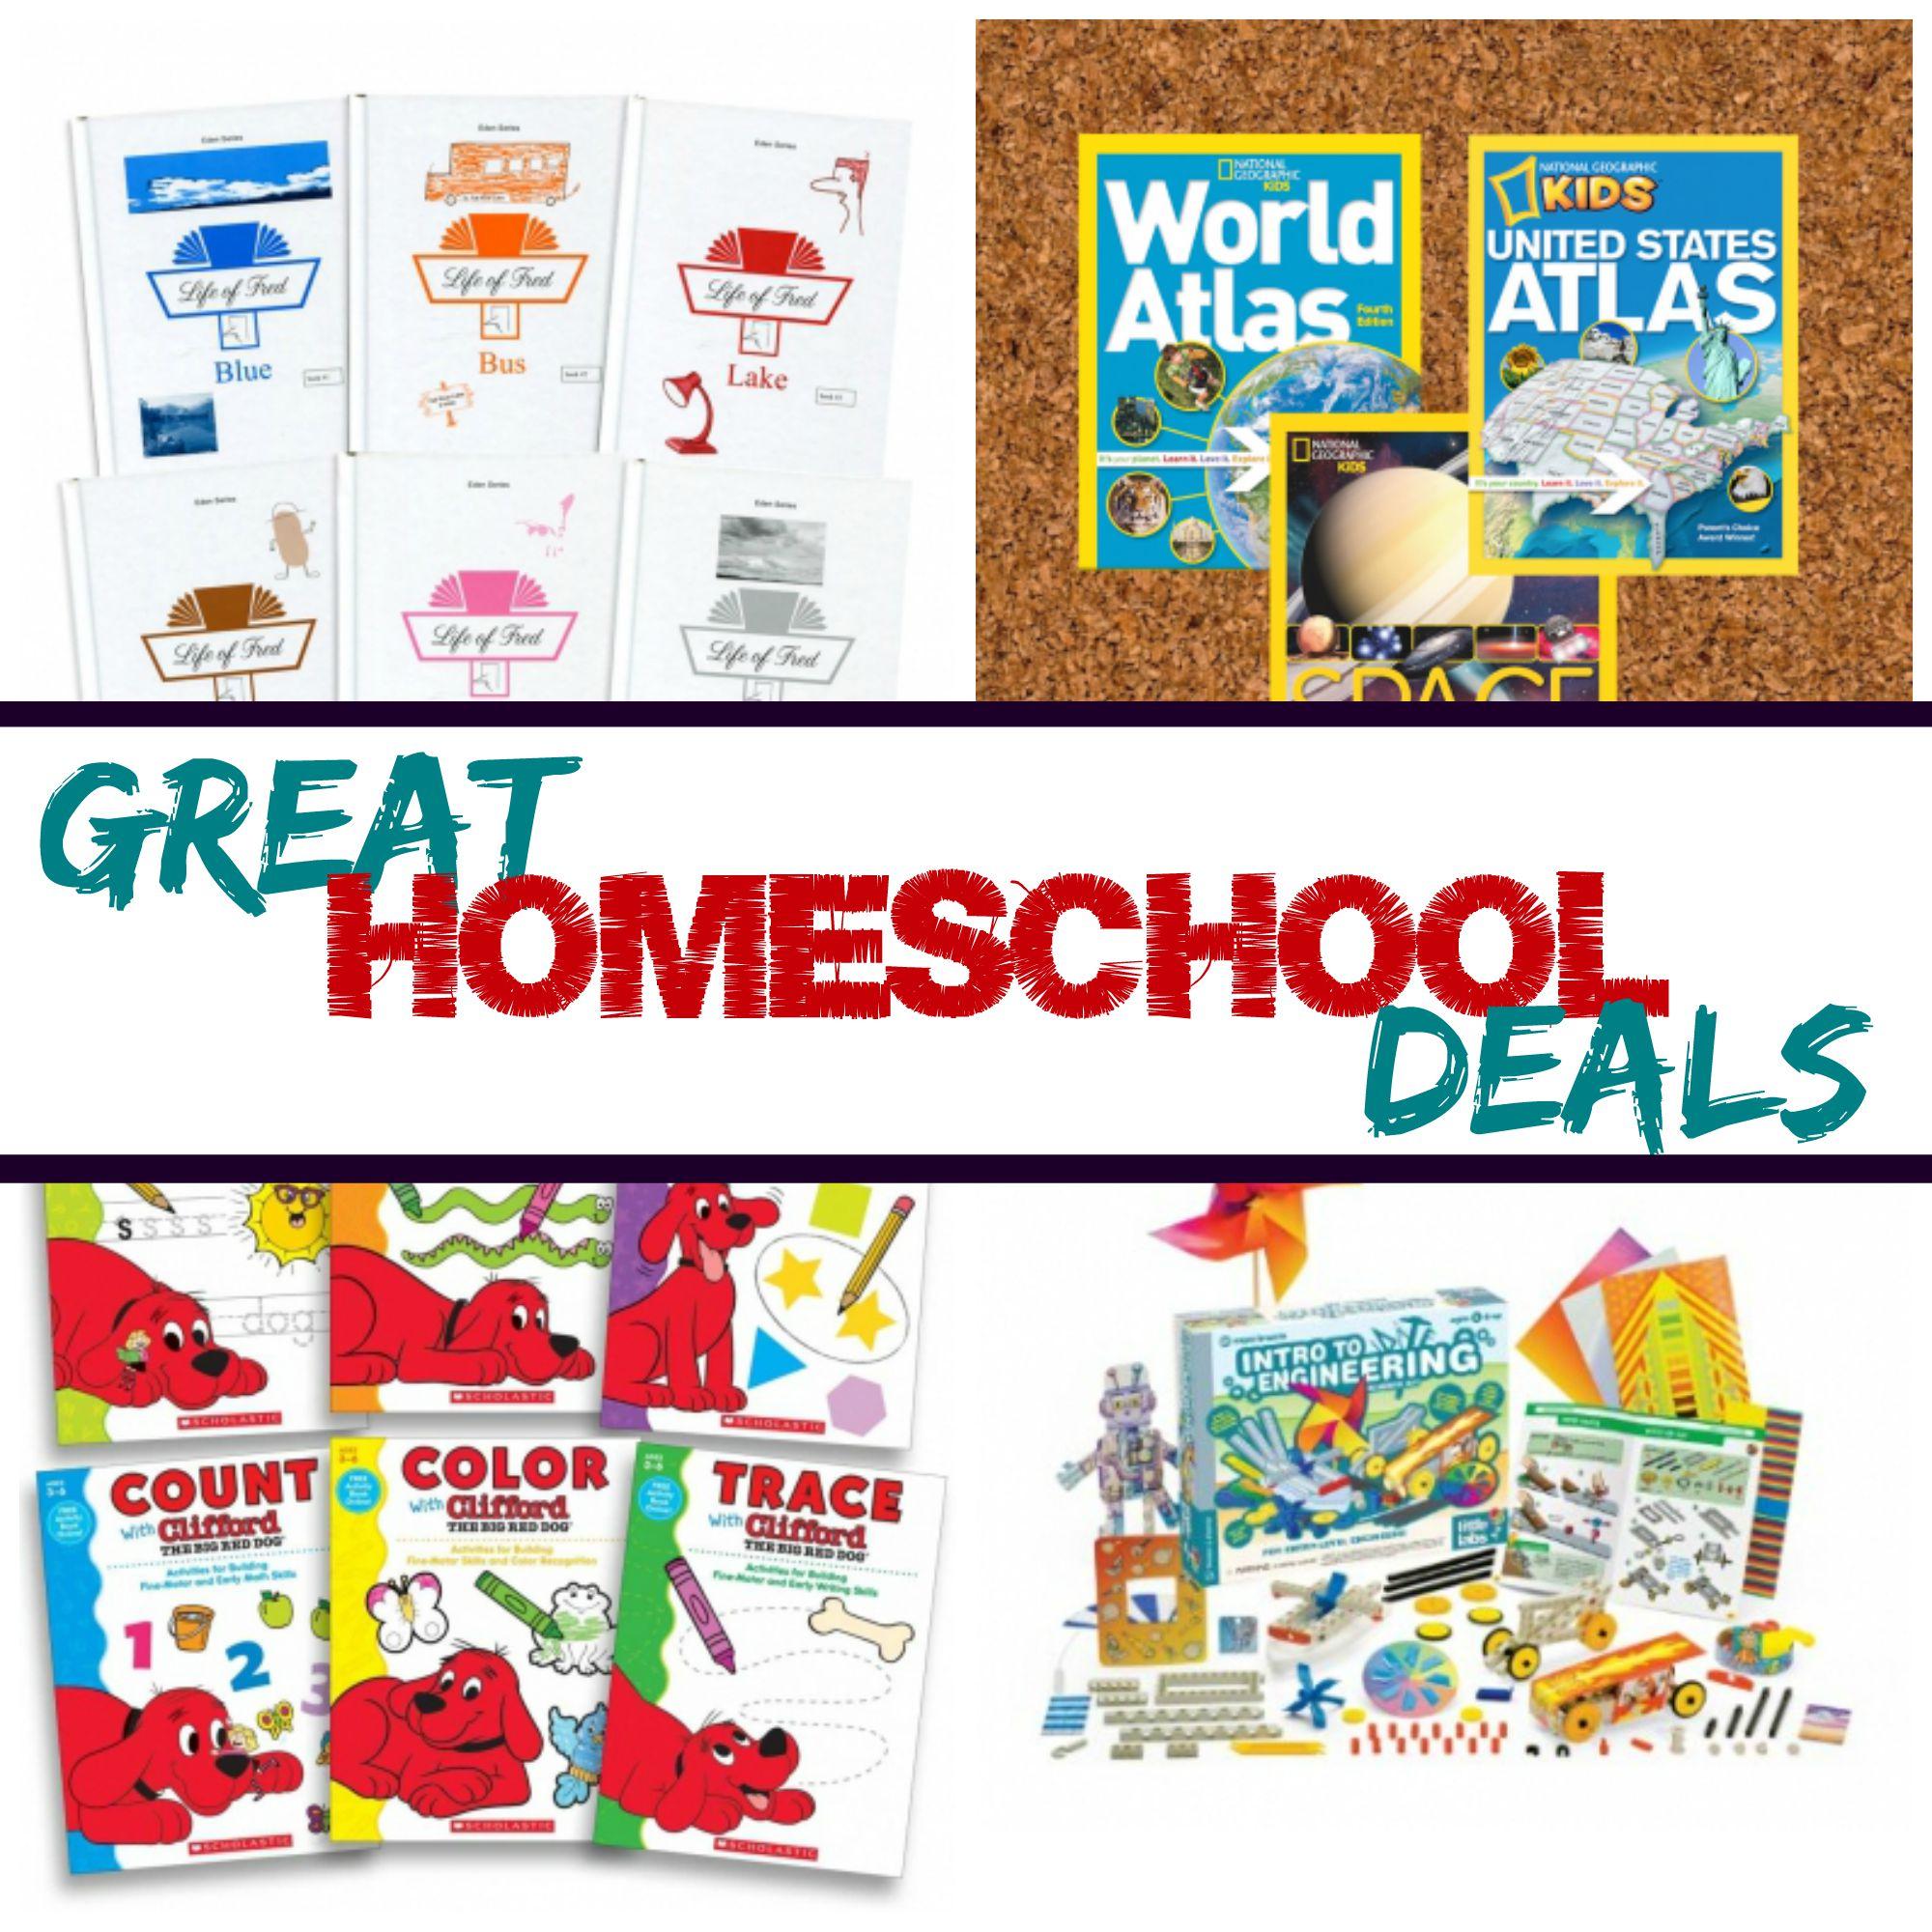 19 New Homeschool Freebies Deals Amp More For 7 22 15